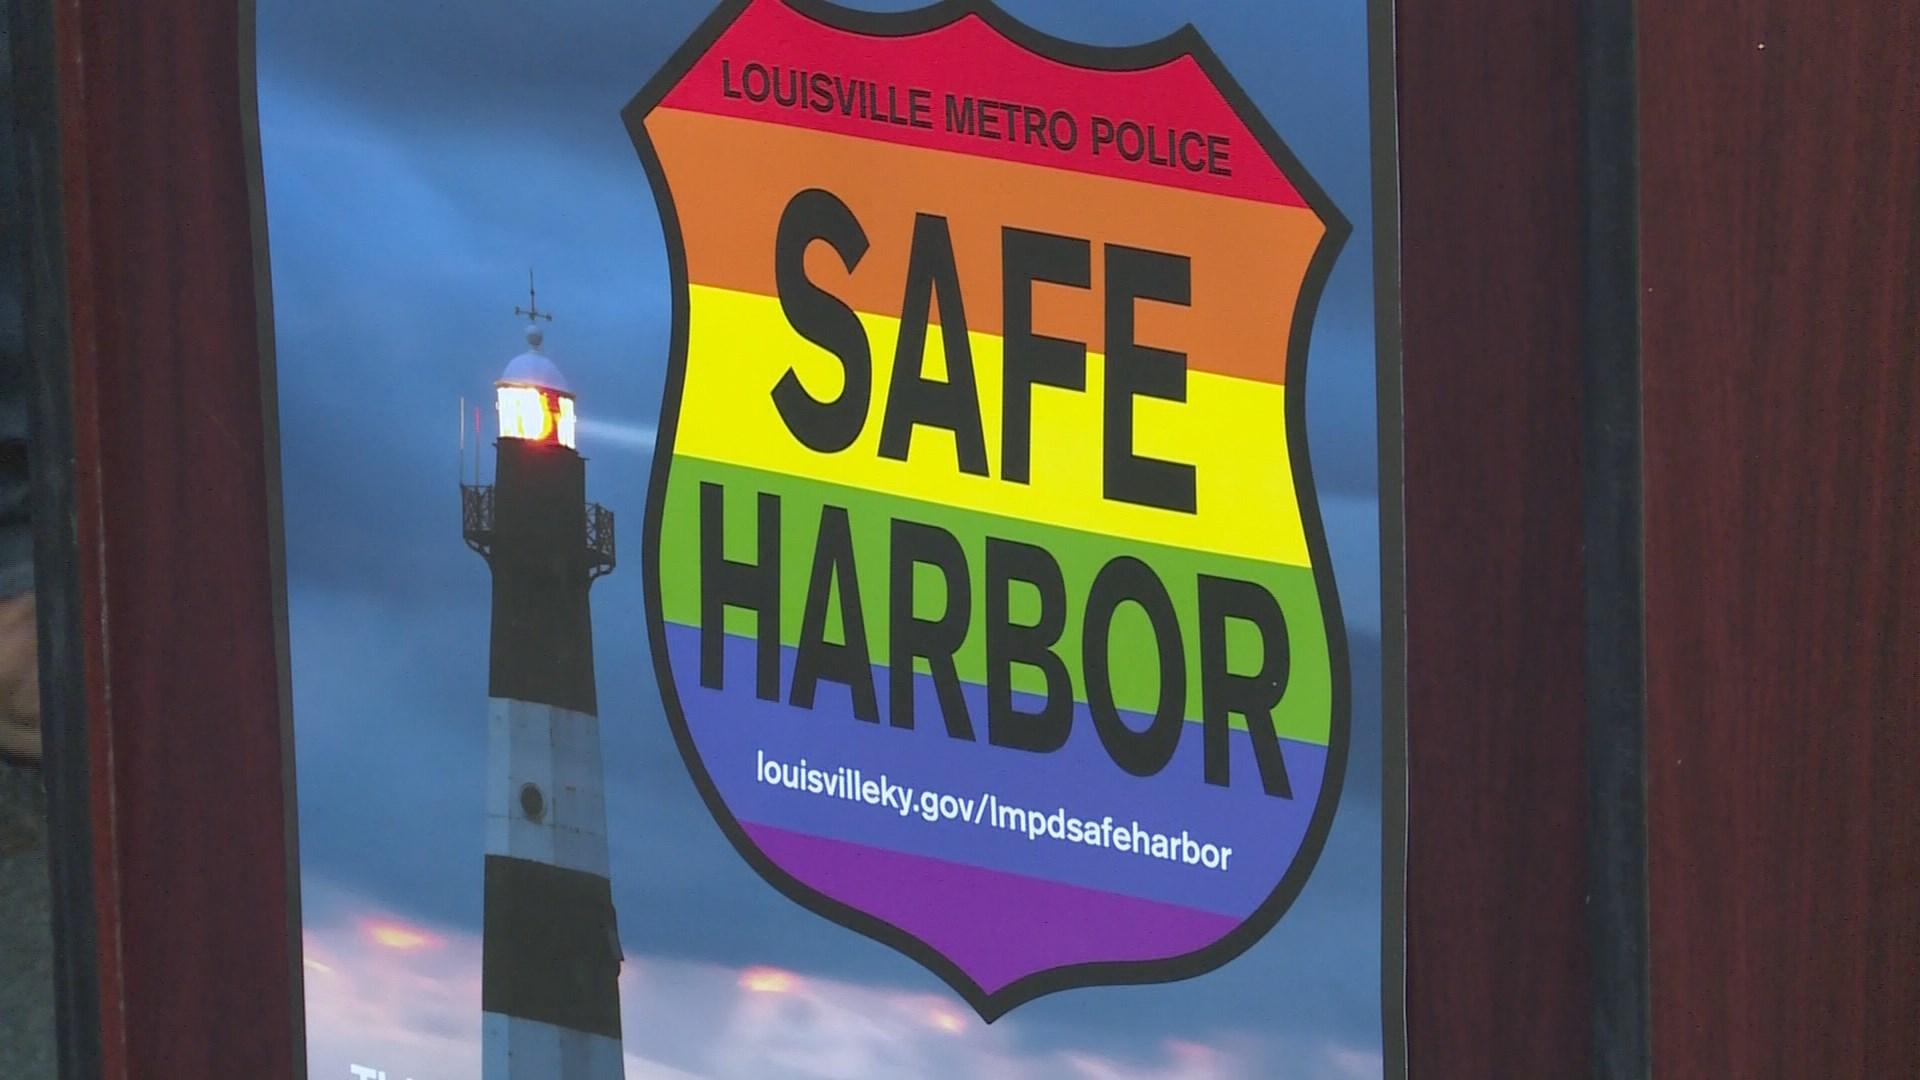 new  u0026 39 safe harbor u0026 39  initiative unveiled to protect lgbtq